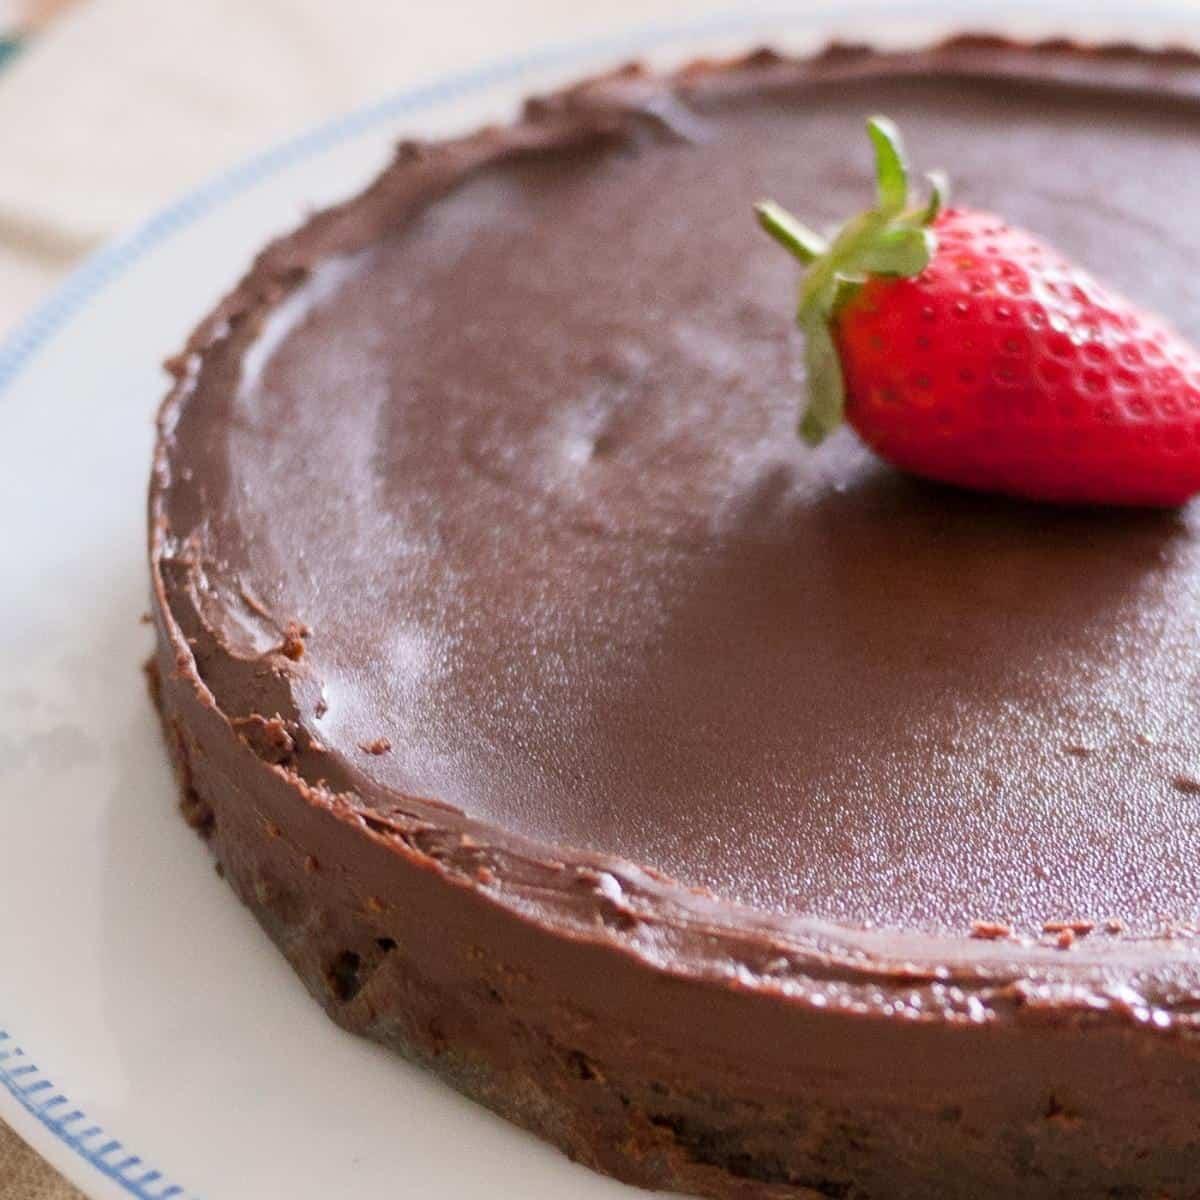 Chocolate cake on a plate.